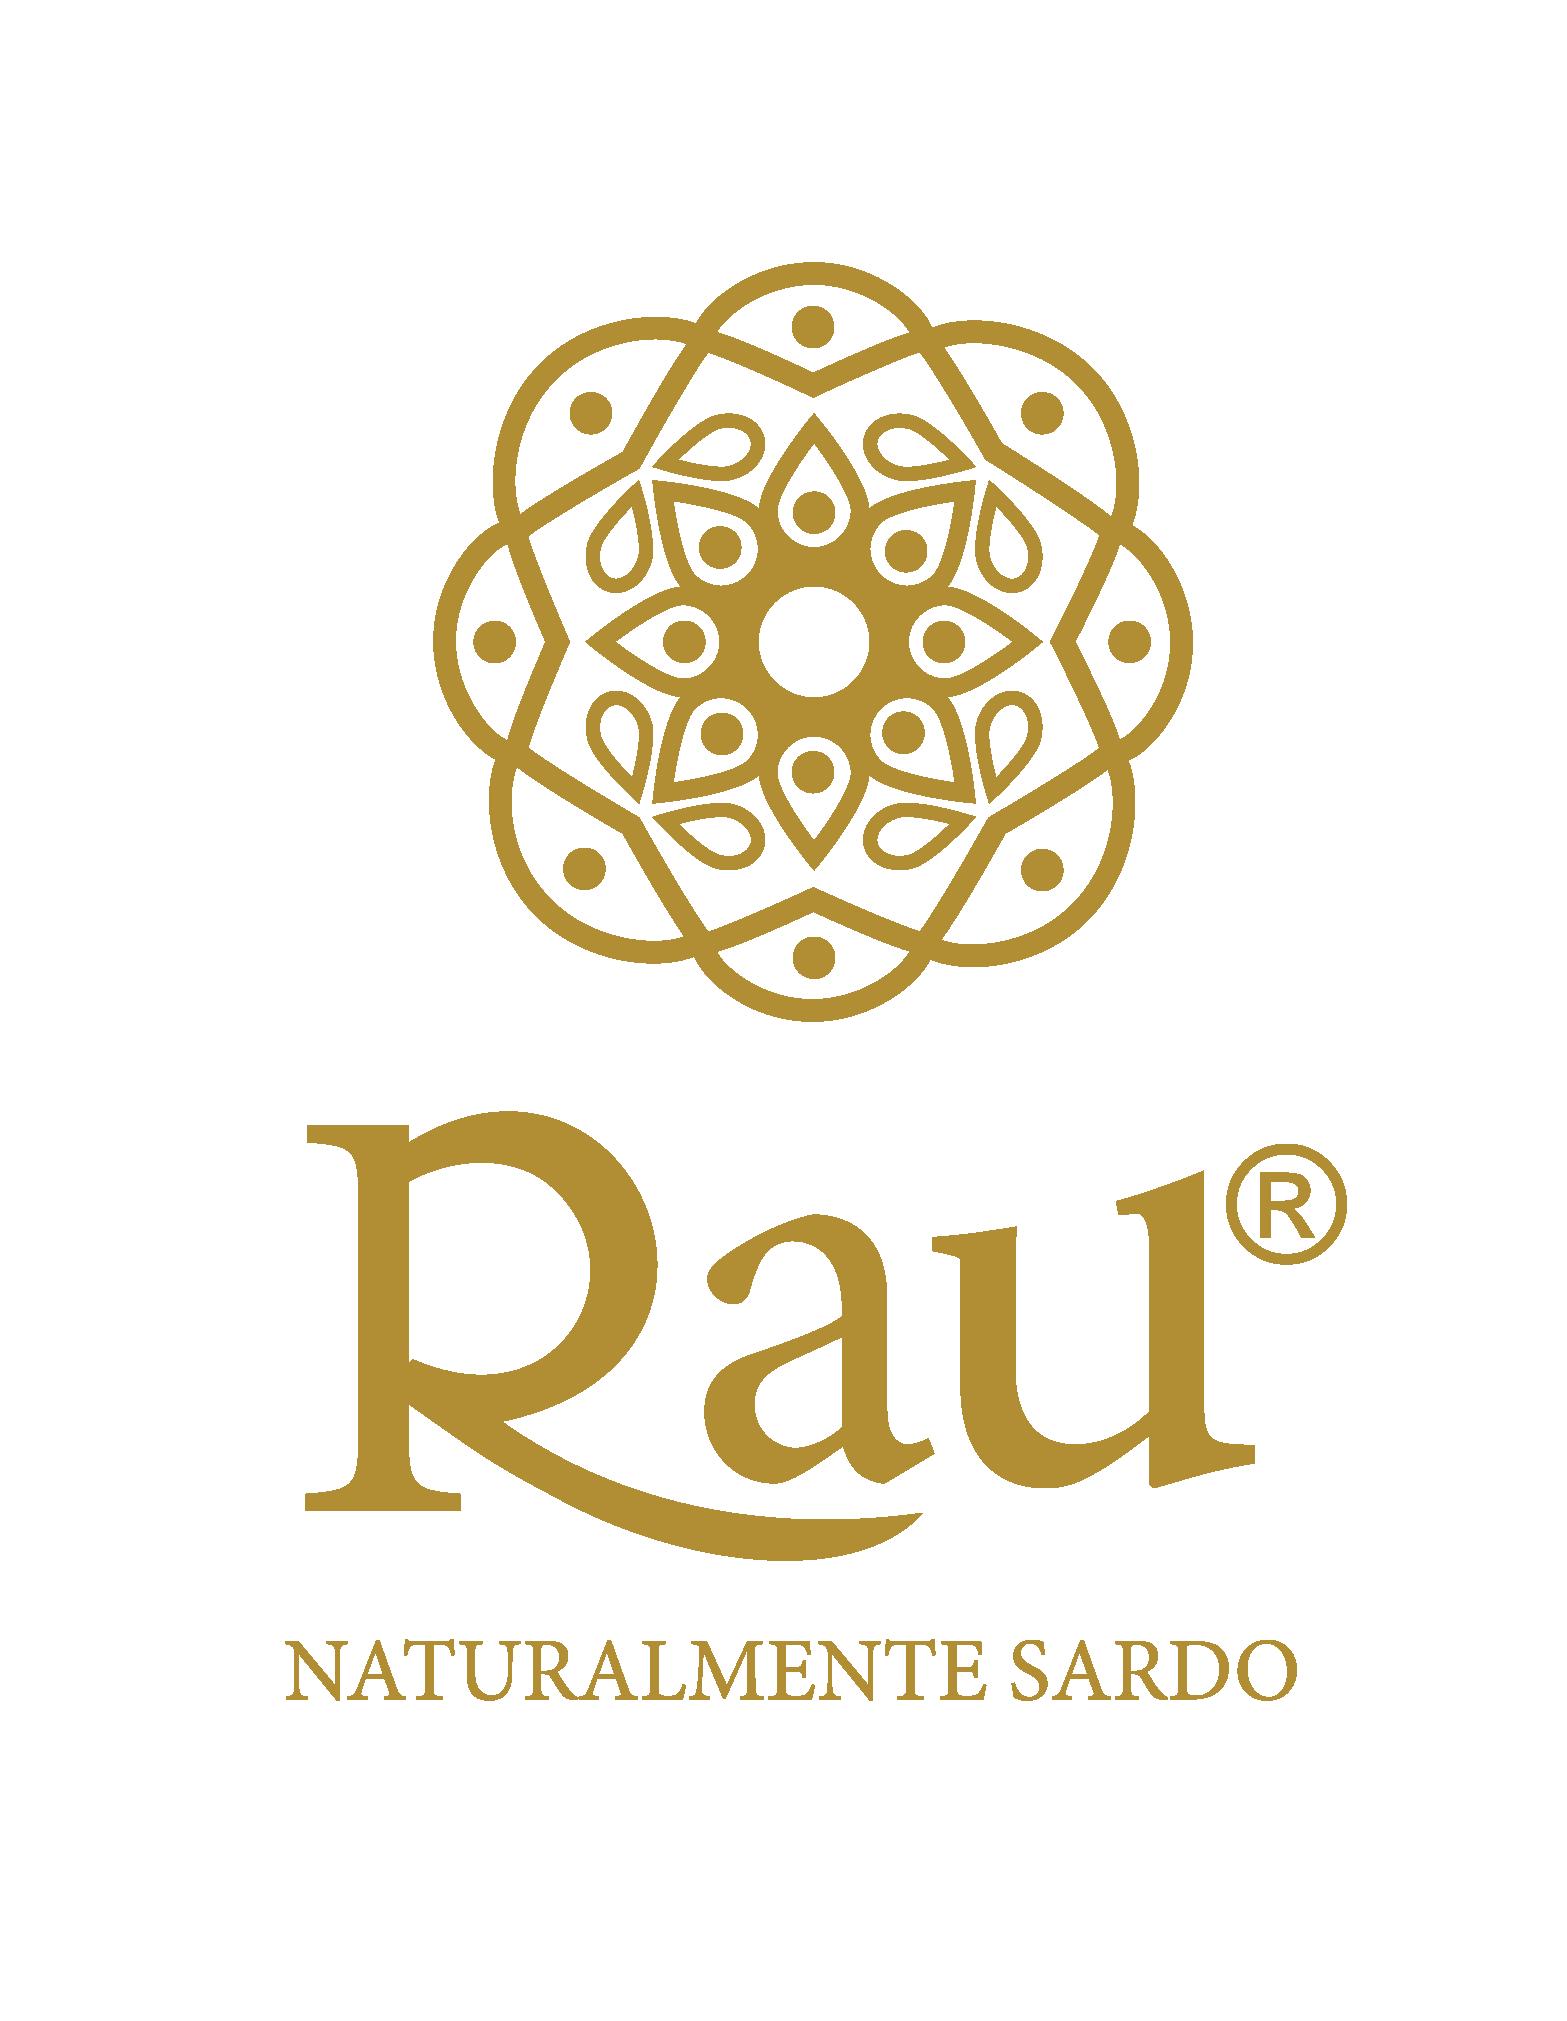 Rau – Pasticceria artigianale – Vendita online di Colombe artigianali, Lievitati salati artigianali e Dolci tradizionali